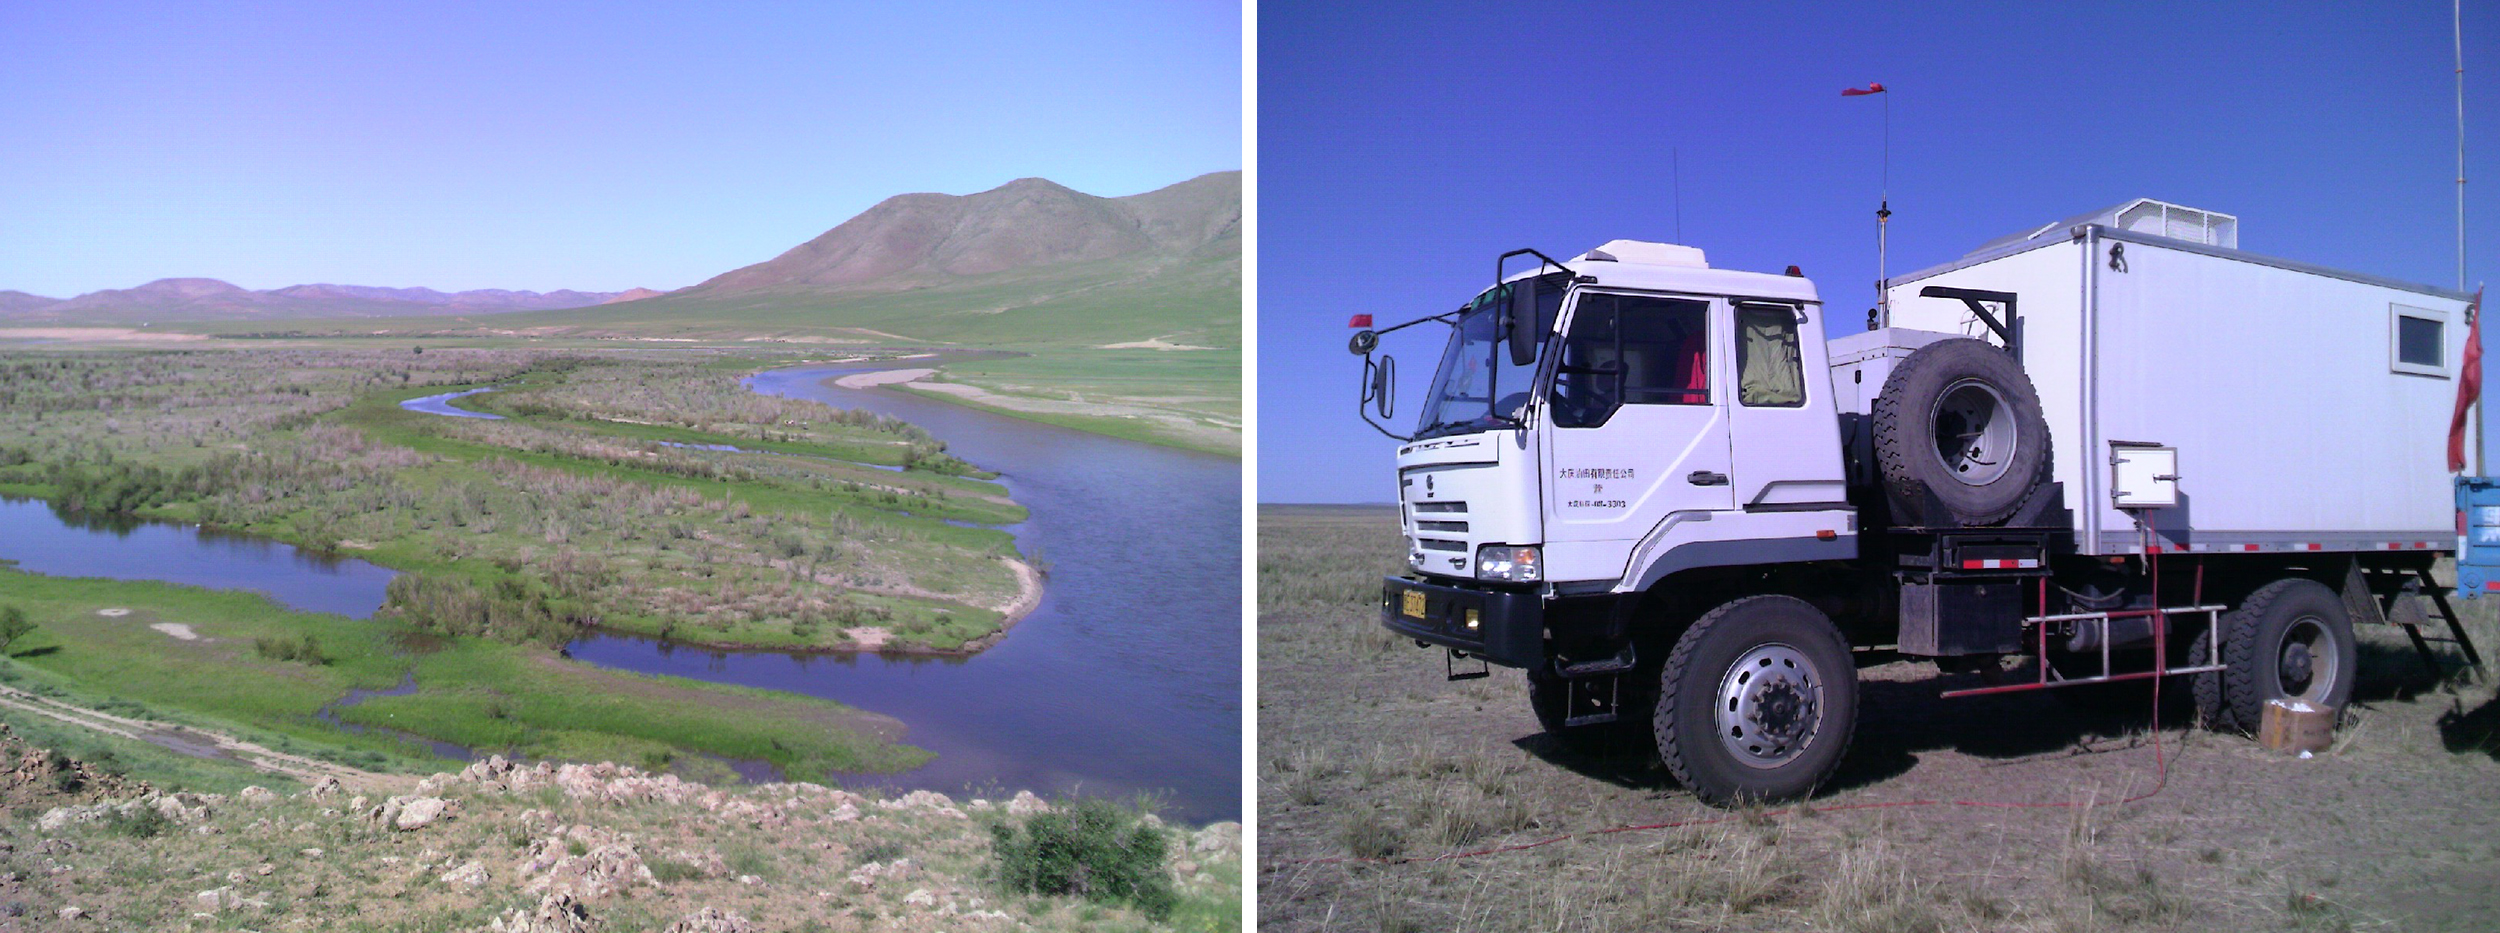 Mongolia, Khorlen river